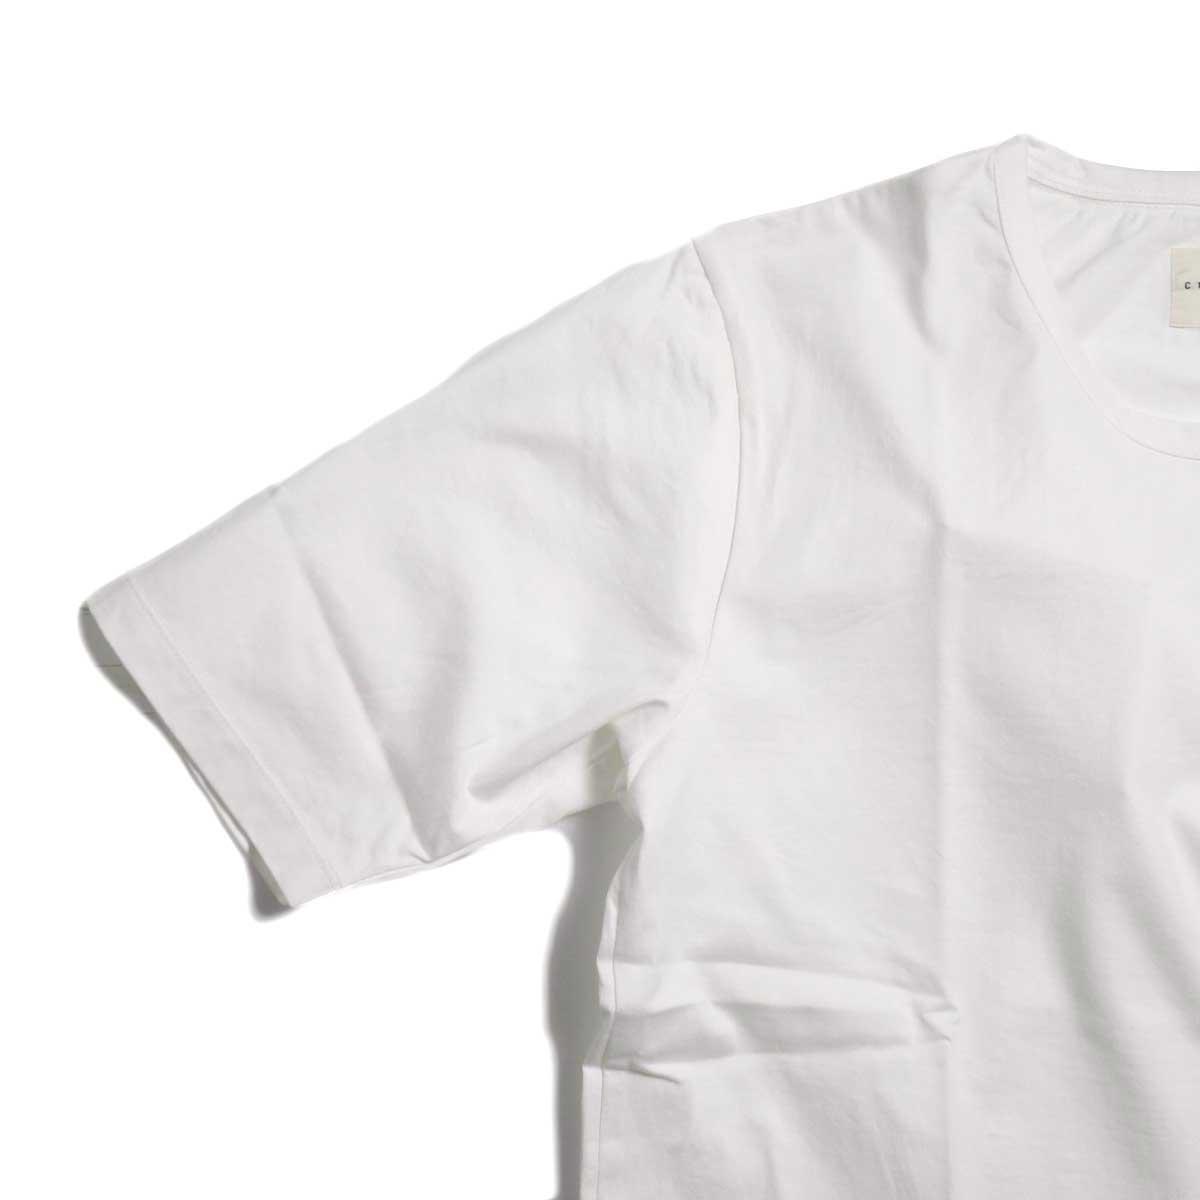 CURLY / SDH HS CN TEE -White ハーフスリーブ